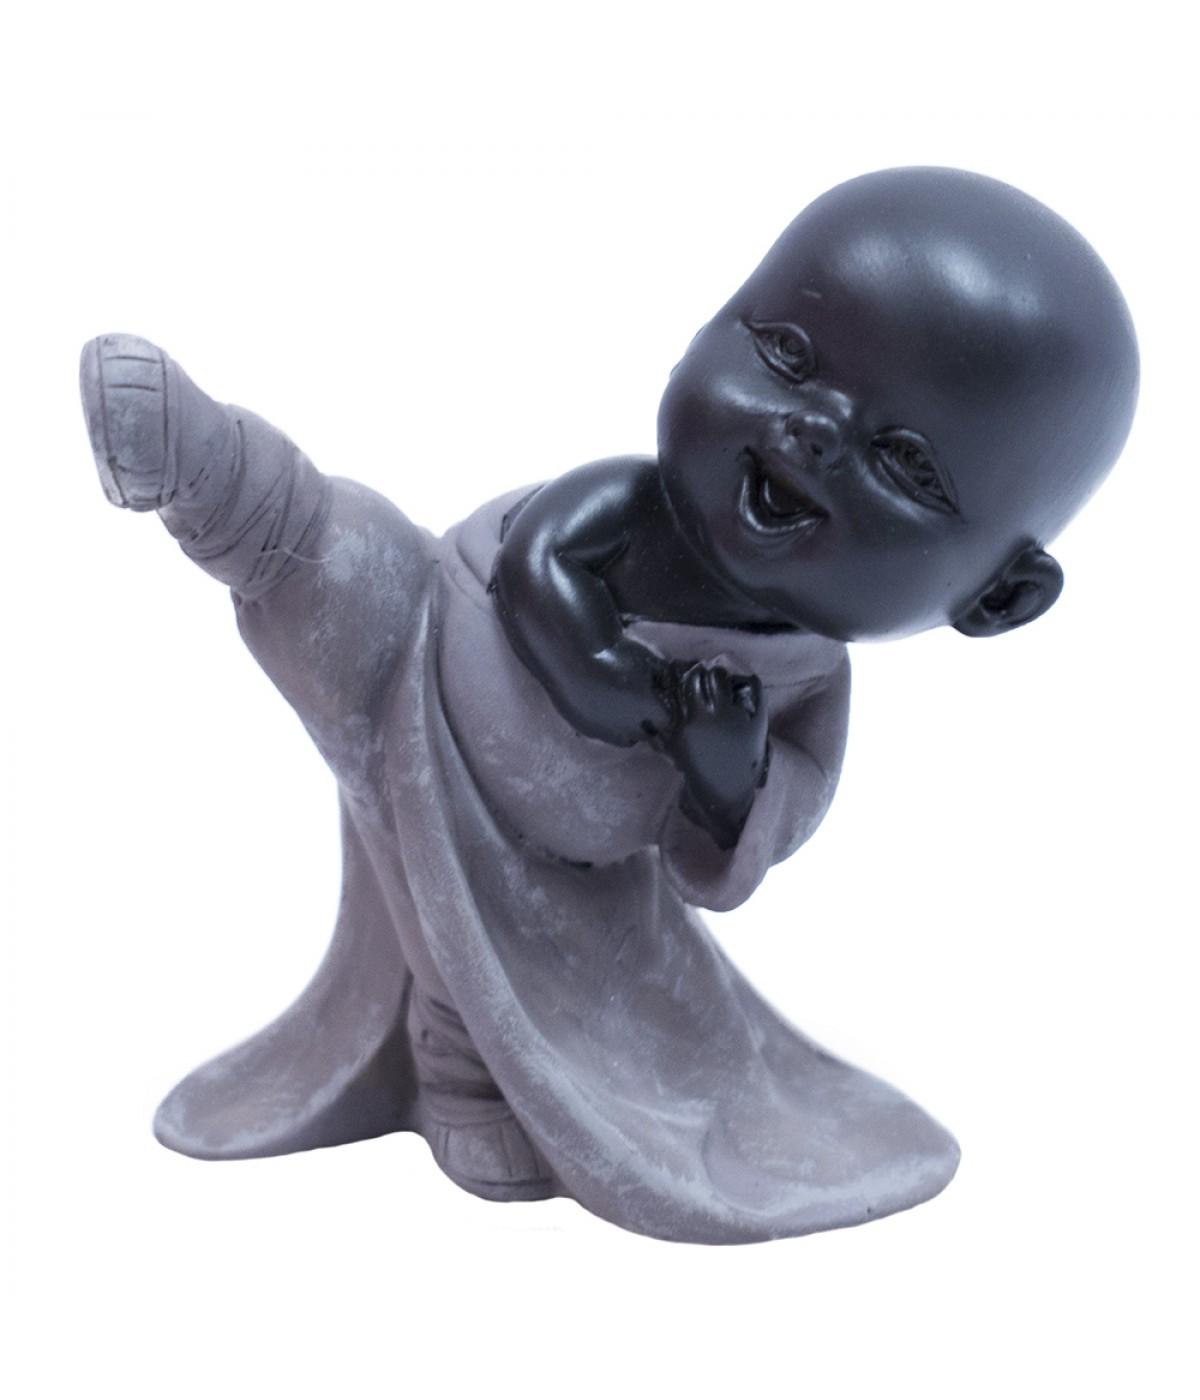 Monge Resina Preta Chute Kungfu 9cm